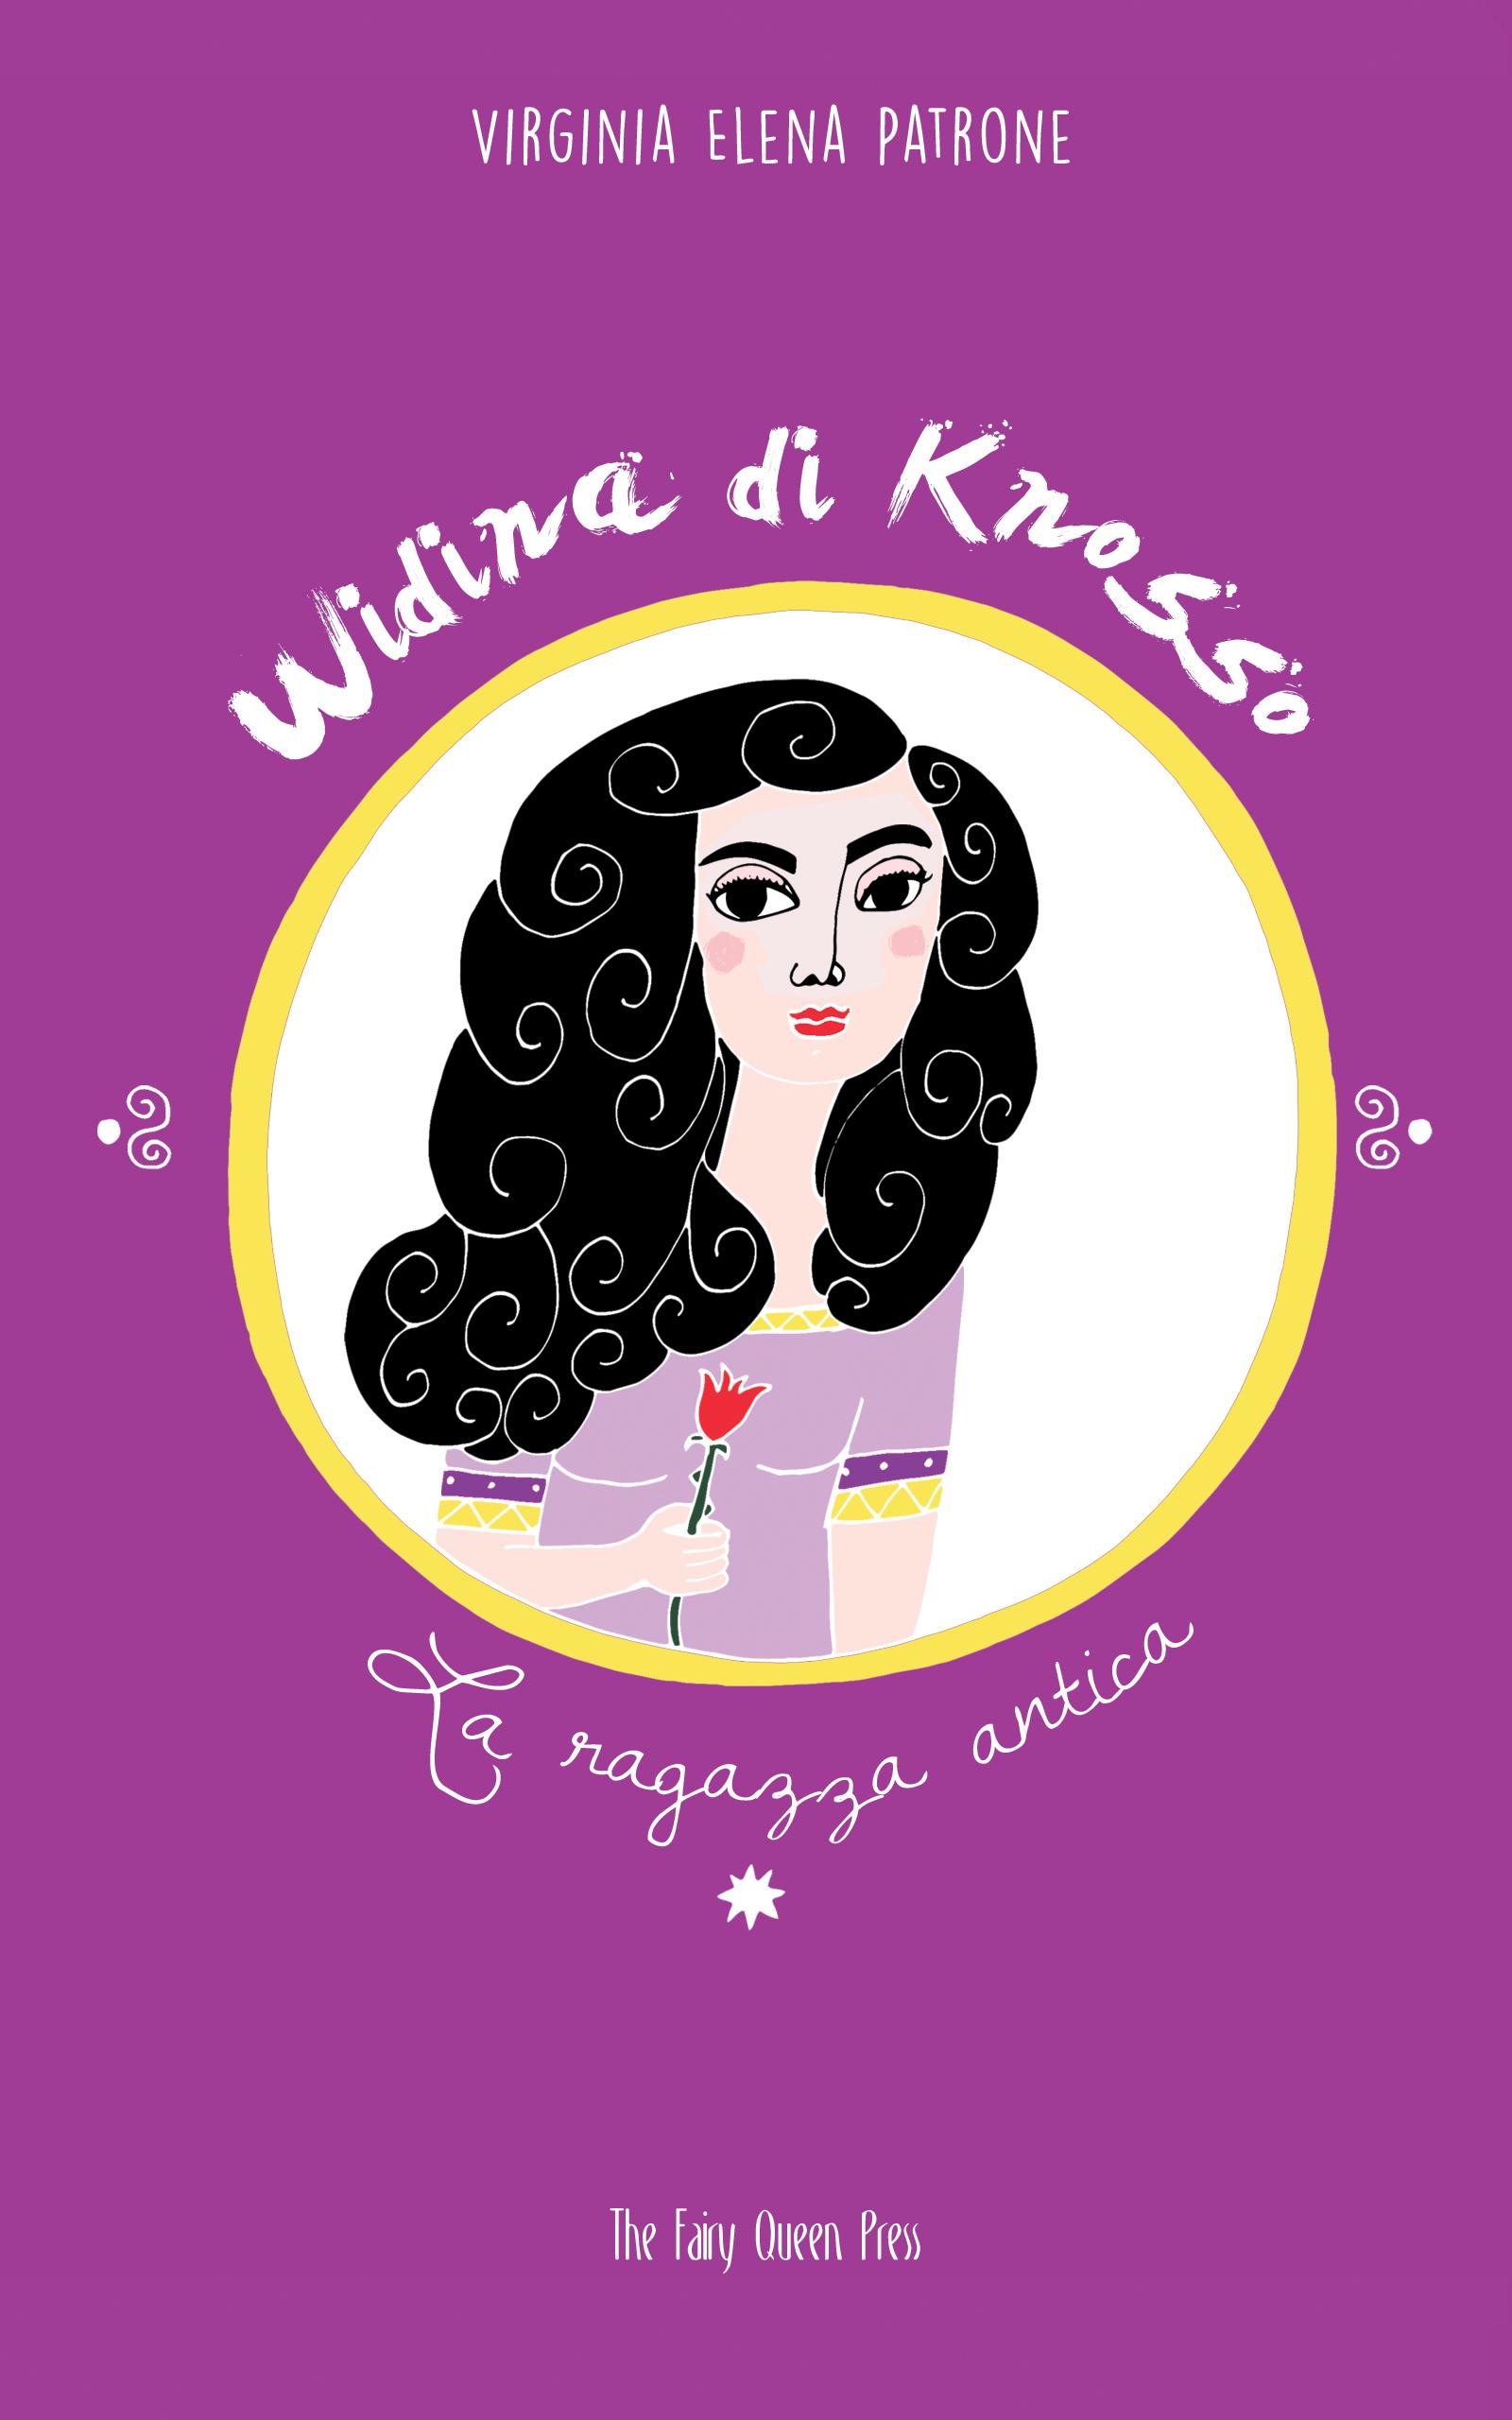 Widina_Book Cover_by Virginia Elena Patrone